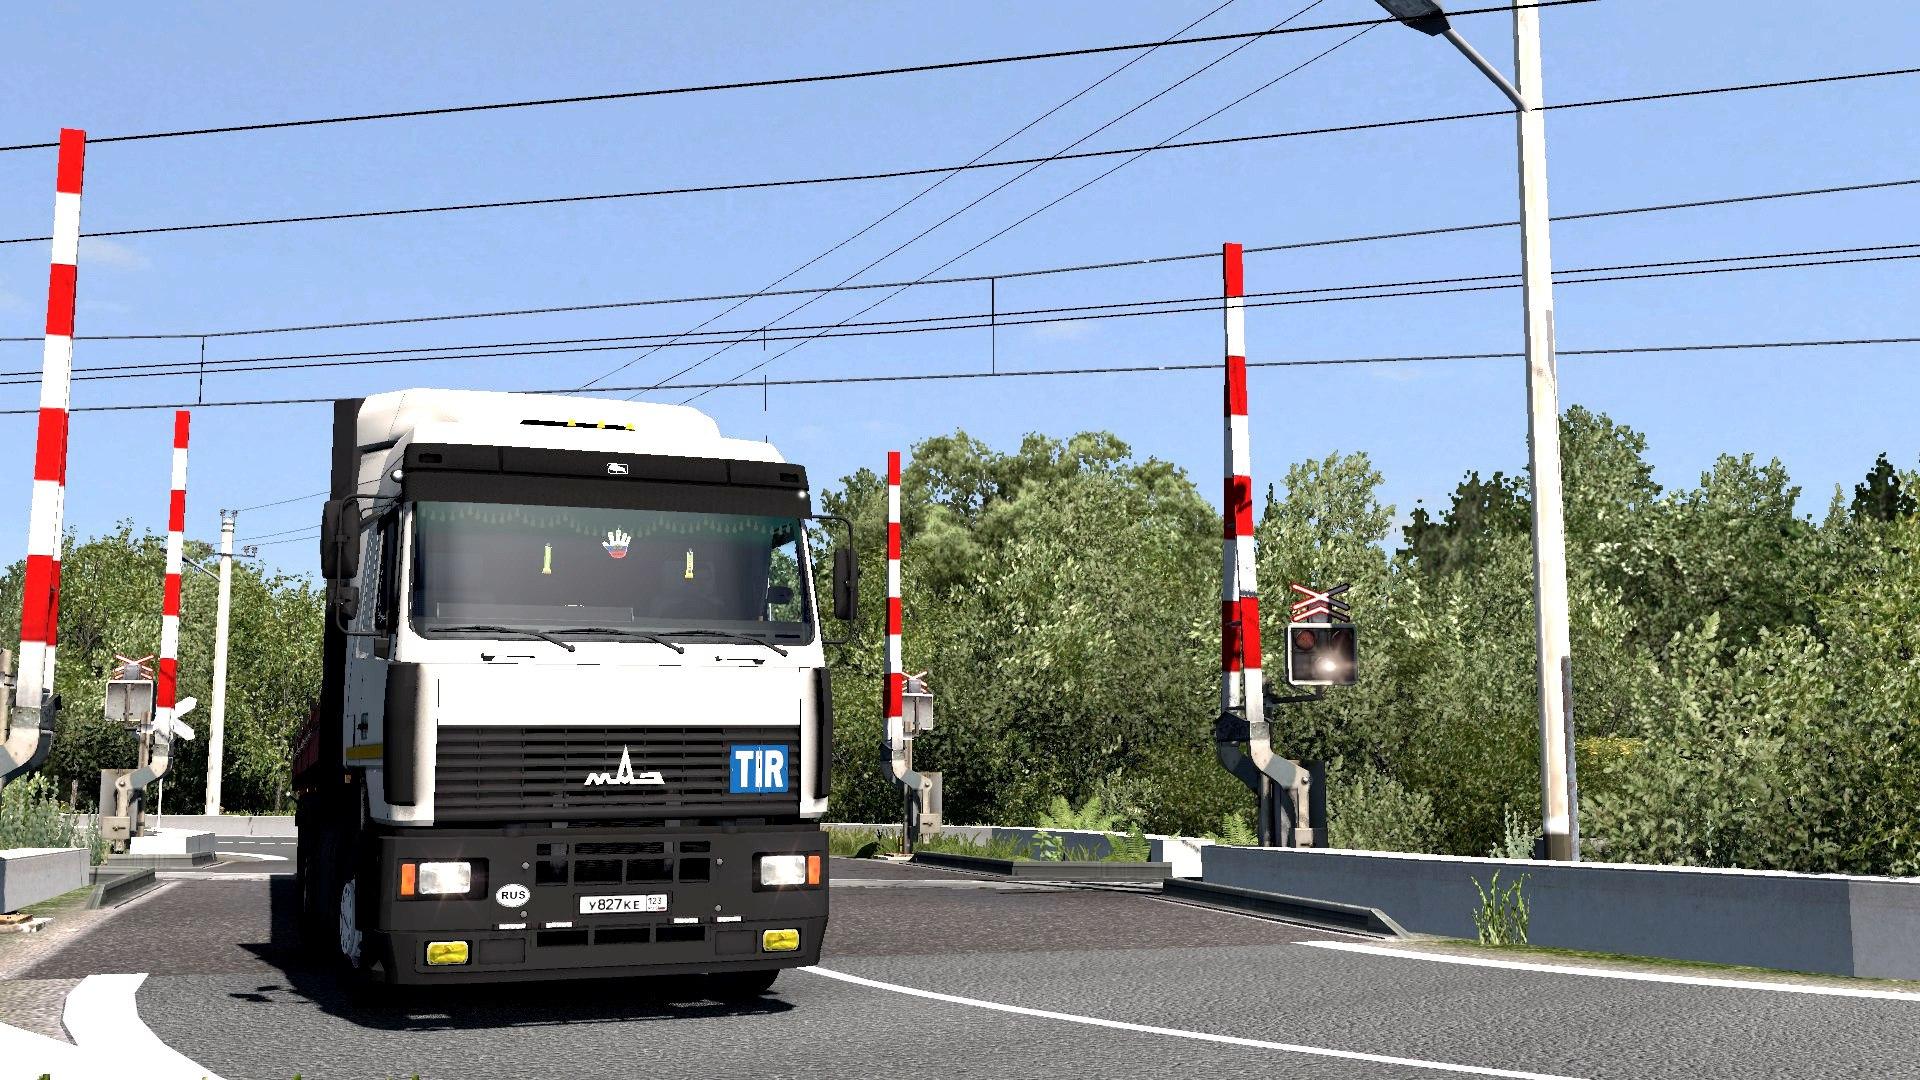 aJ_iisg9U1g.jpg - Euro Truck Simulator 2